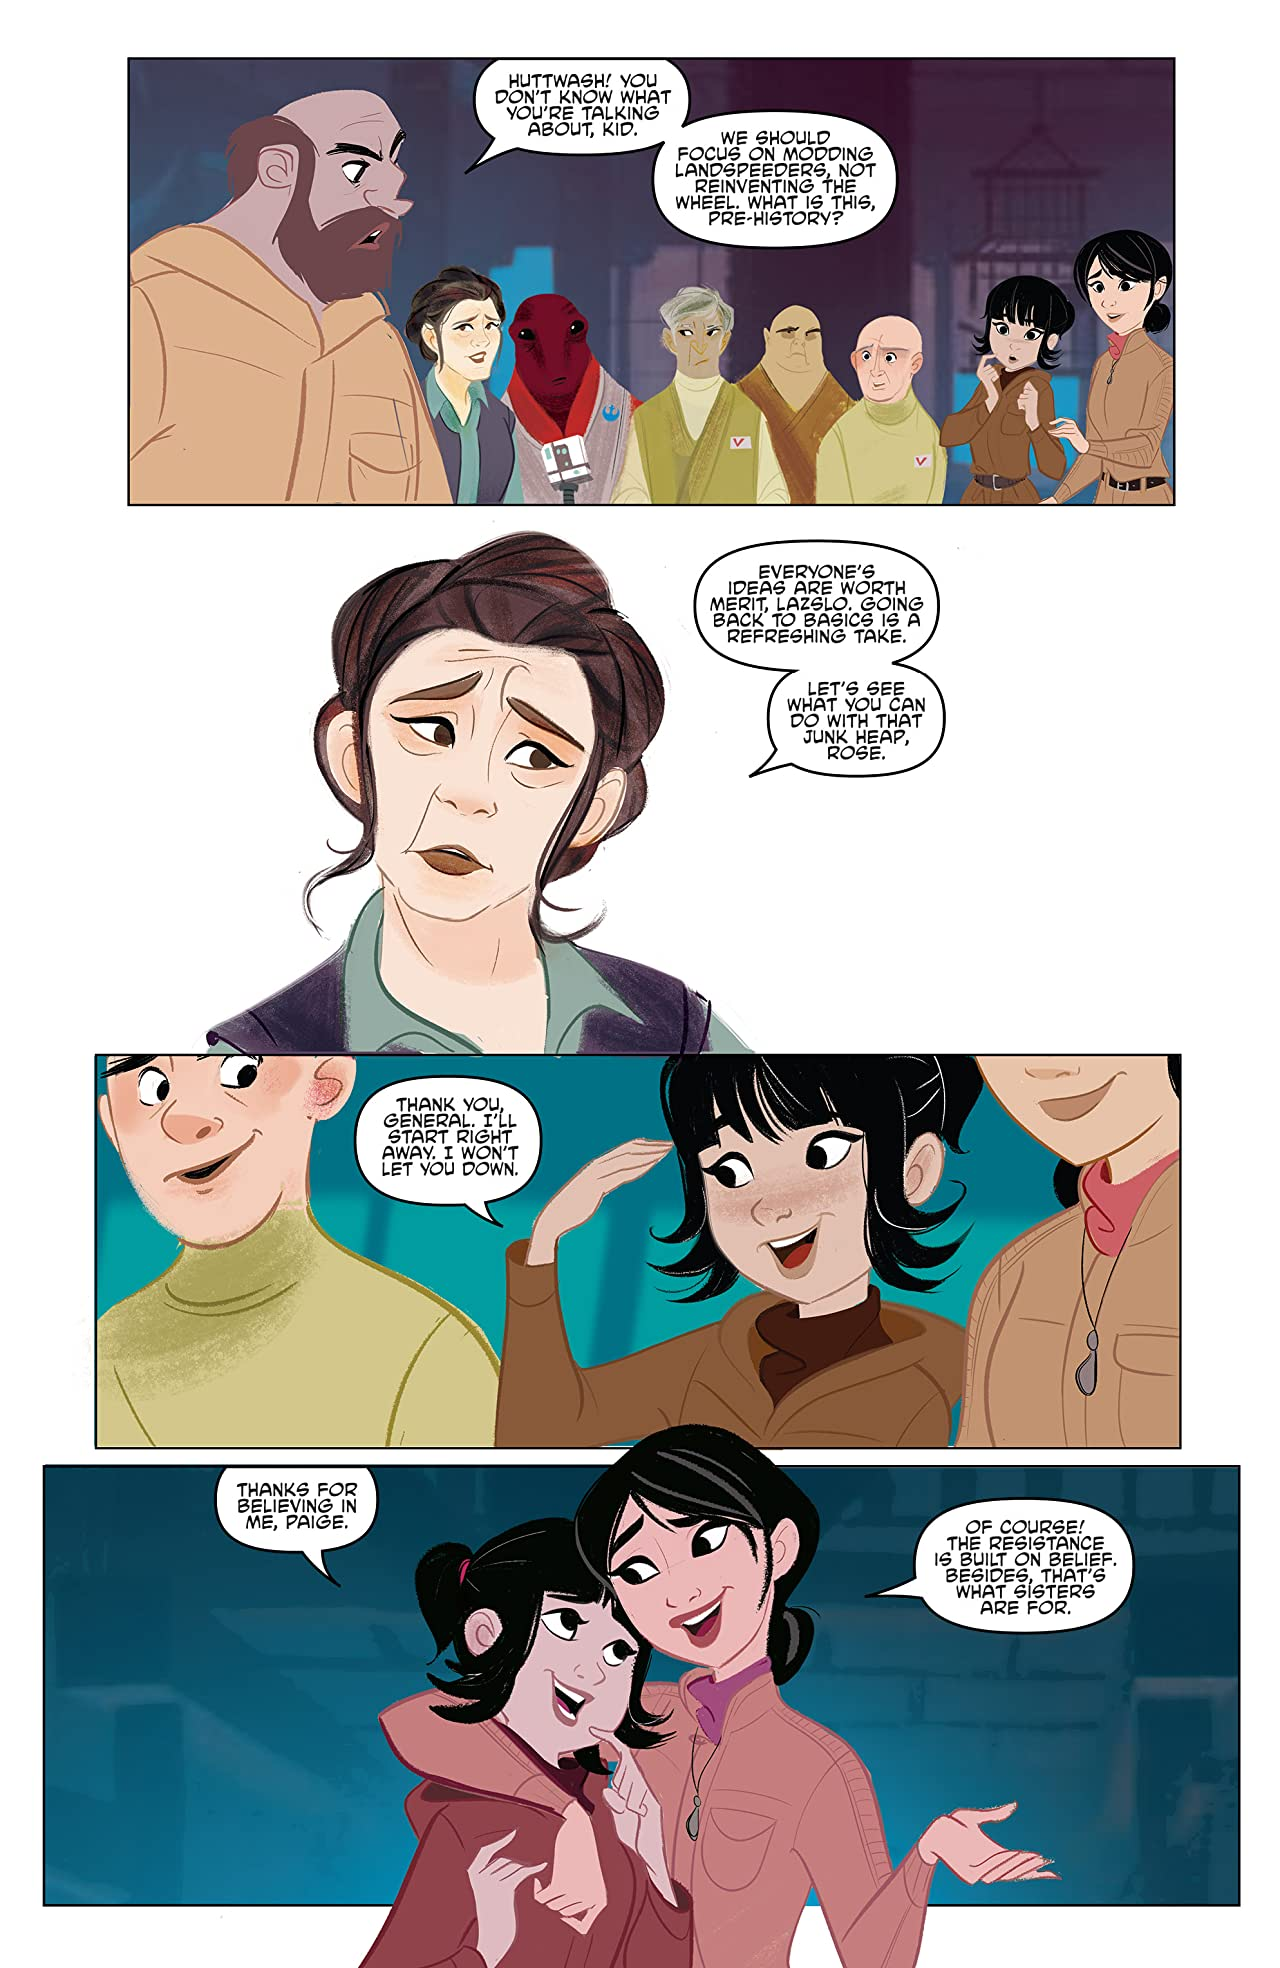 Star Wars Adventures: Forces of Destiny—Rose & Paige